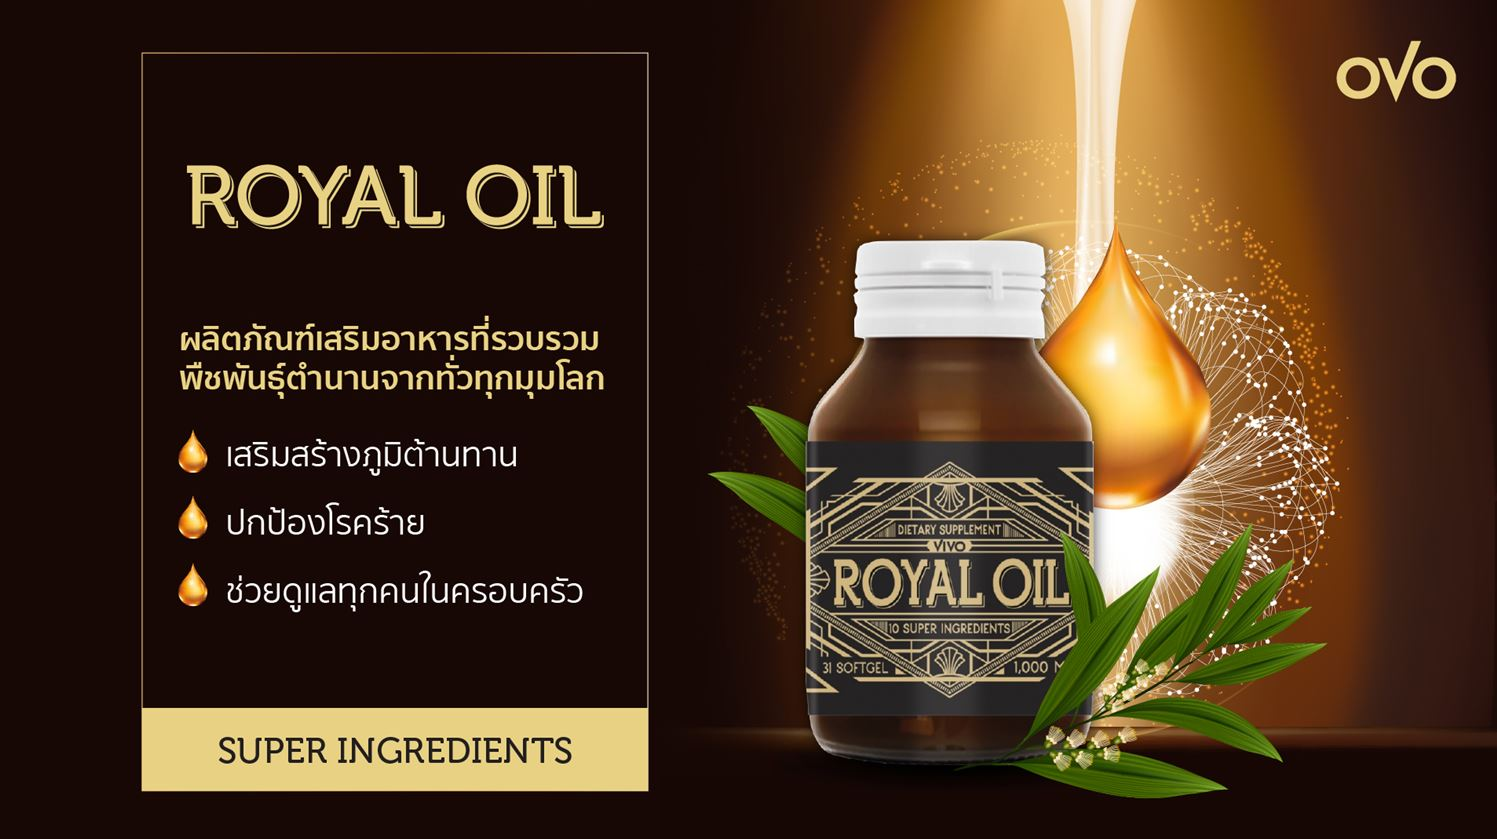 royal oil ราคา เท่าไหร่